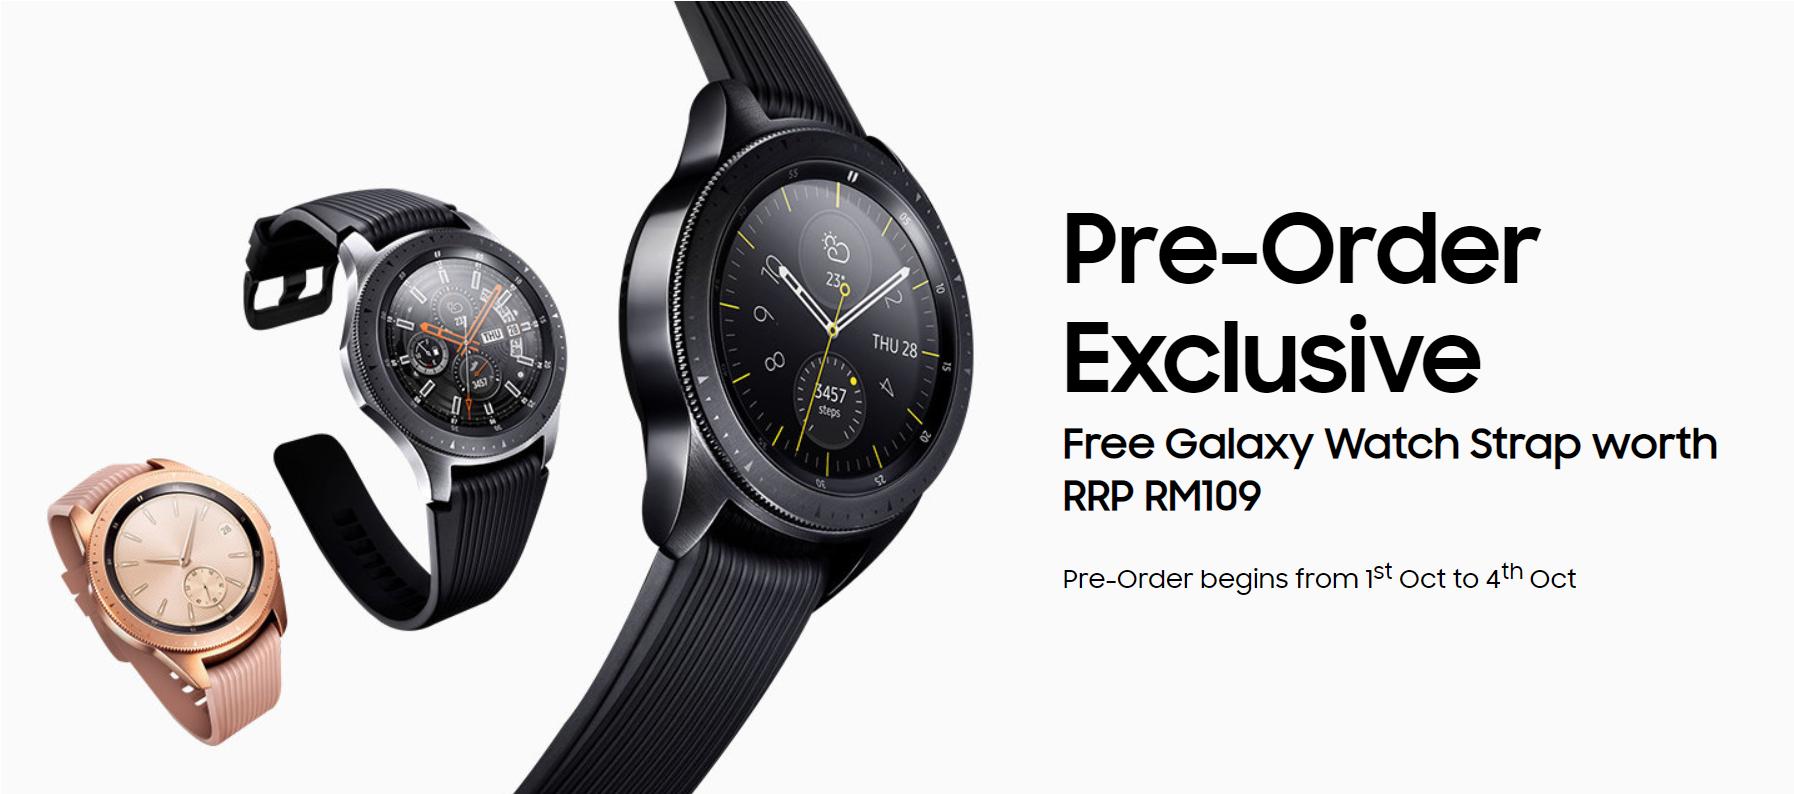 Samsung Galaxy Watch Harga Technave